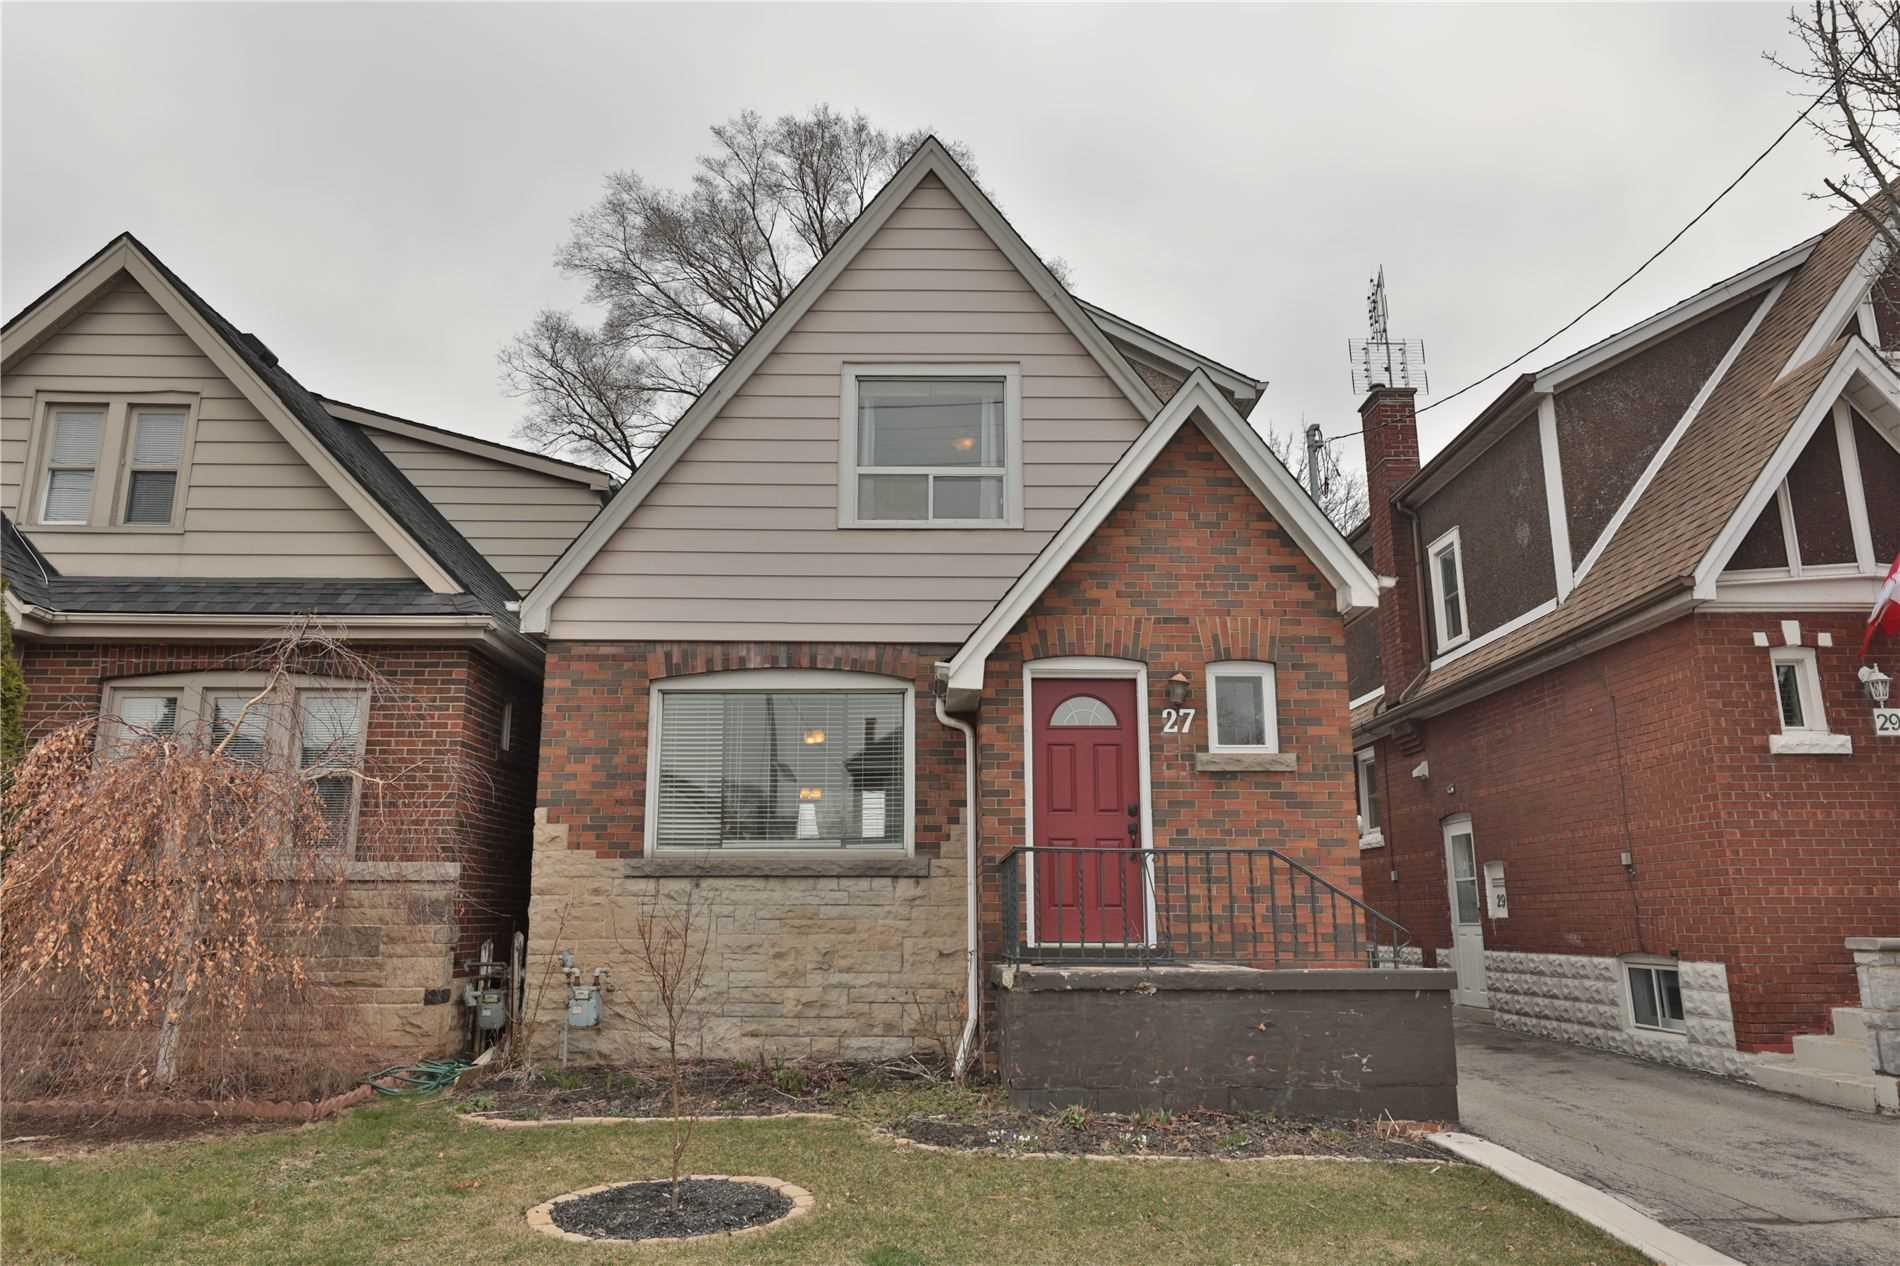 27 Kenilworth Ave, Hamilton, Ontario L8K2S7, 2 Bedrooms Bedrooms, 5 Rooms Rooms,2 BathroomsBathrooms,Detached,For Sale,Kenilworth,X4736422